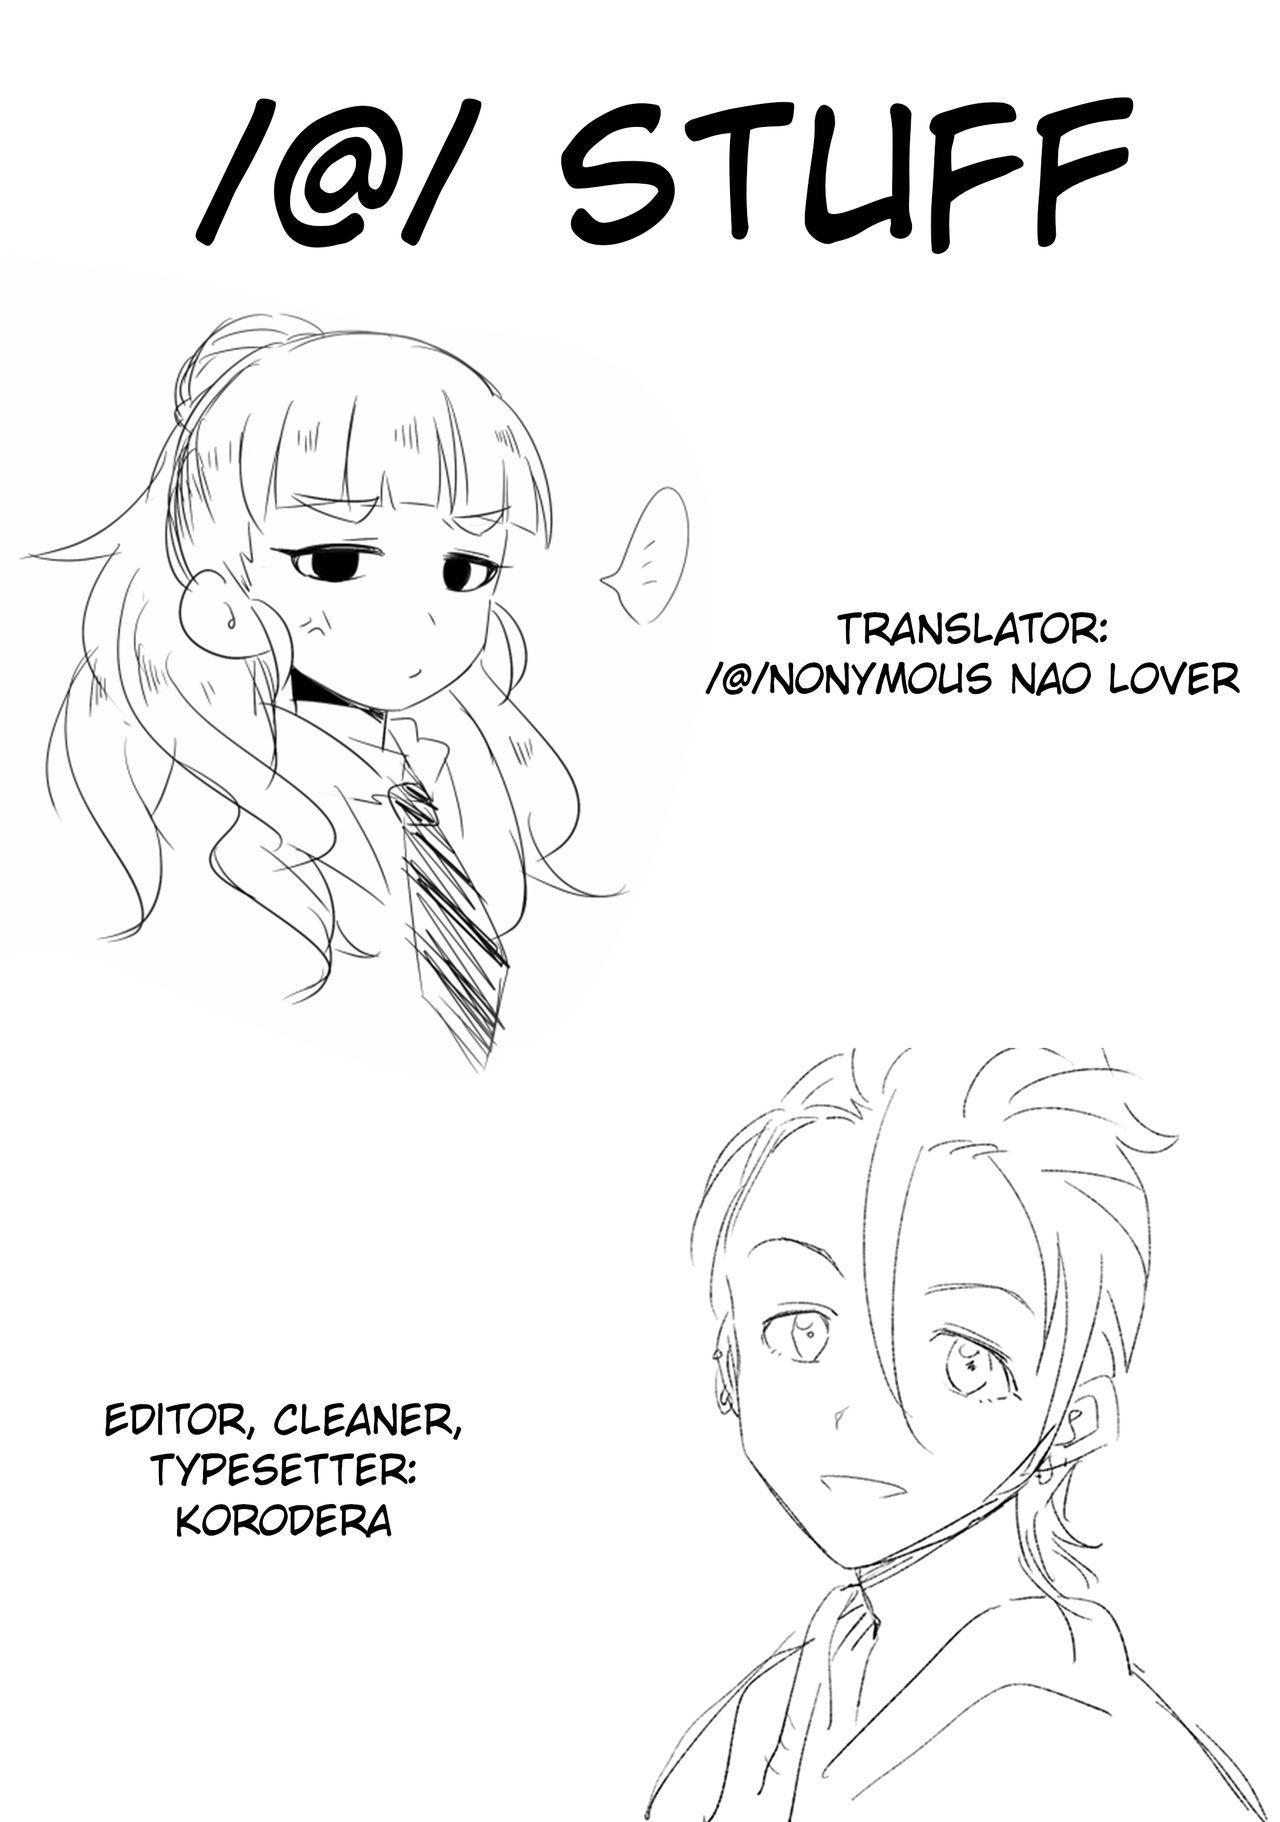 (COMIC1☆10) [Morimiyakan (Morimiya Masayuki)] Sarani, Nao-chan to Asedaku de Suru Hon | The getting all sweaty with Nao-chan book (THE IDOLM@STER CINDERELLA GIRLS) [English] 22